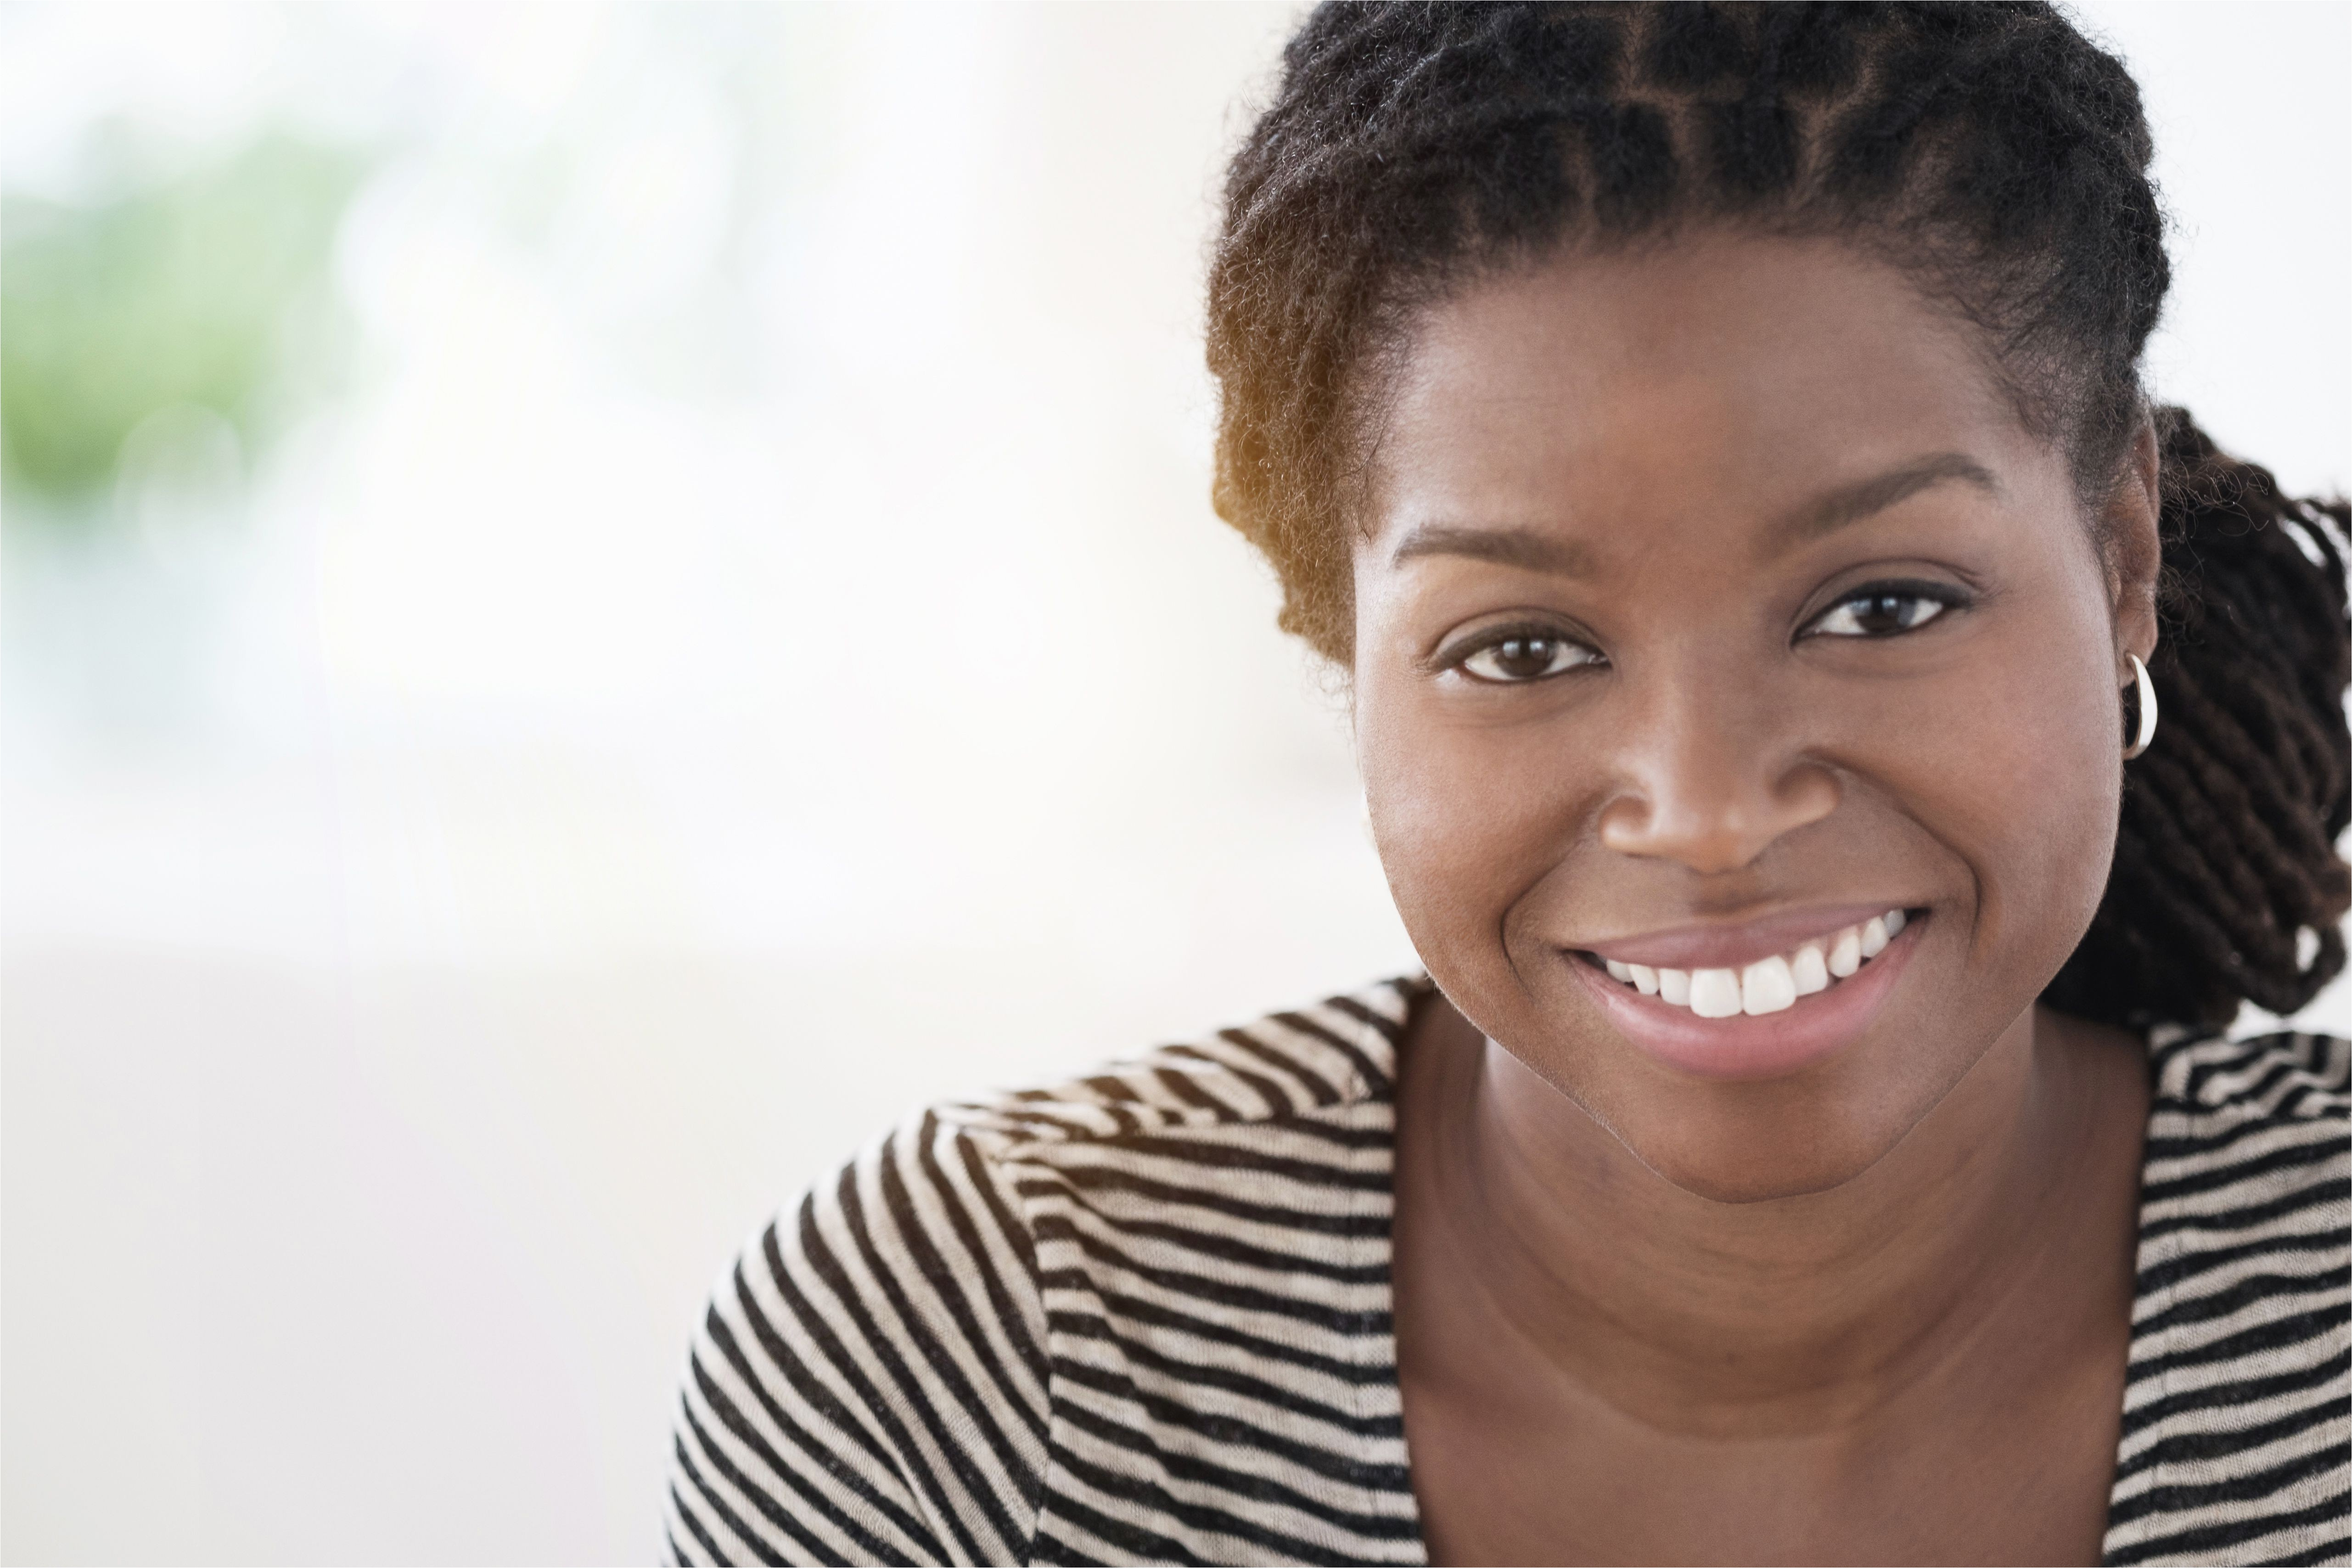 black woman smiling f9b58f0fcf3c106